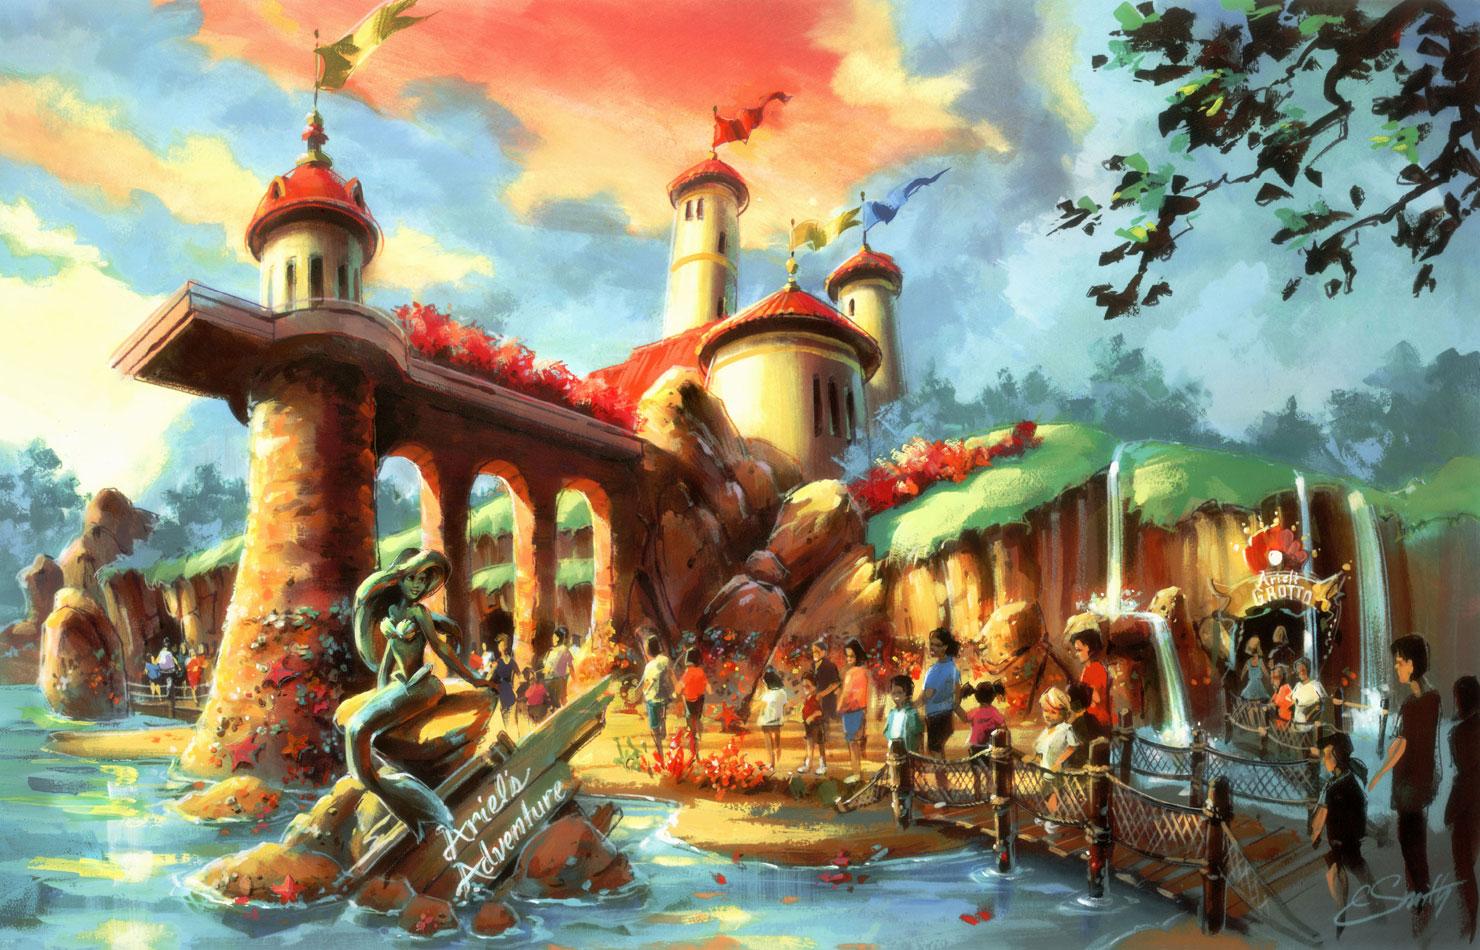 Caf 233 Mickey New Fantasyland